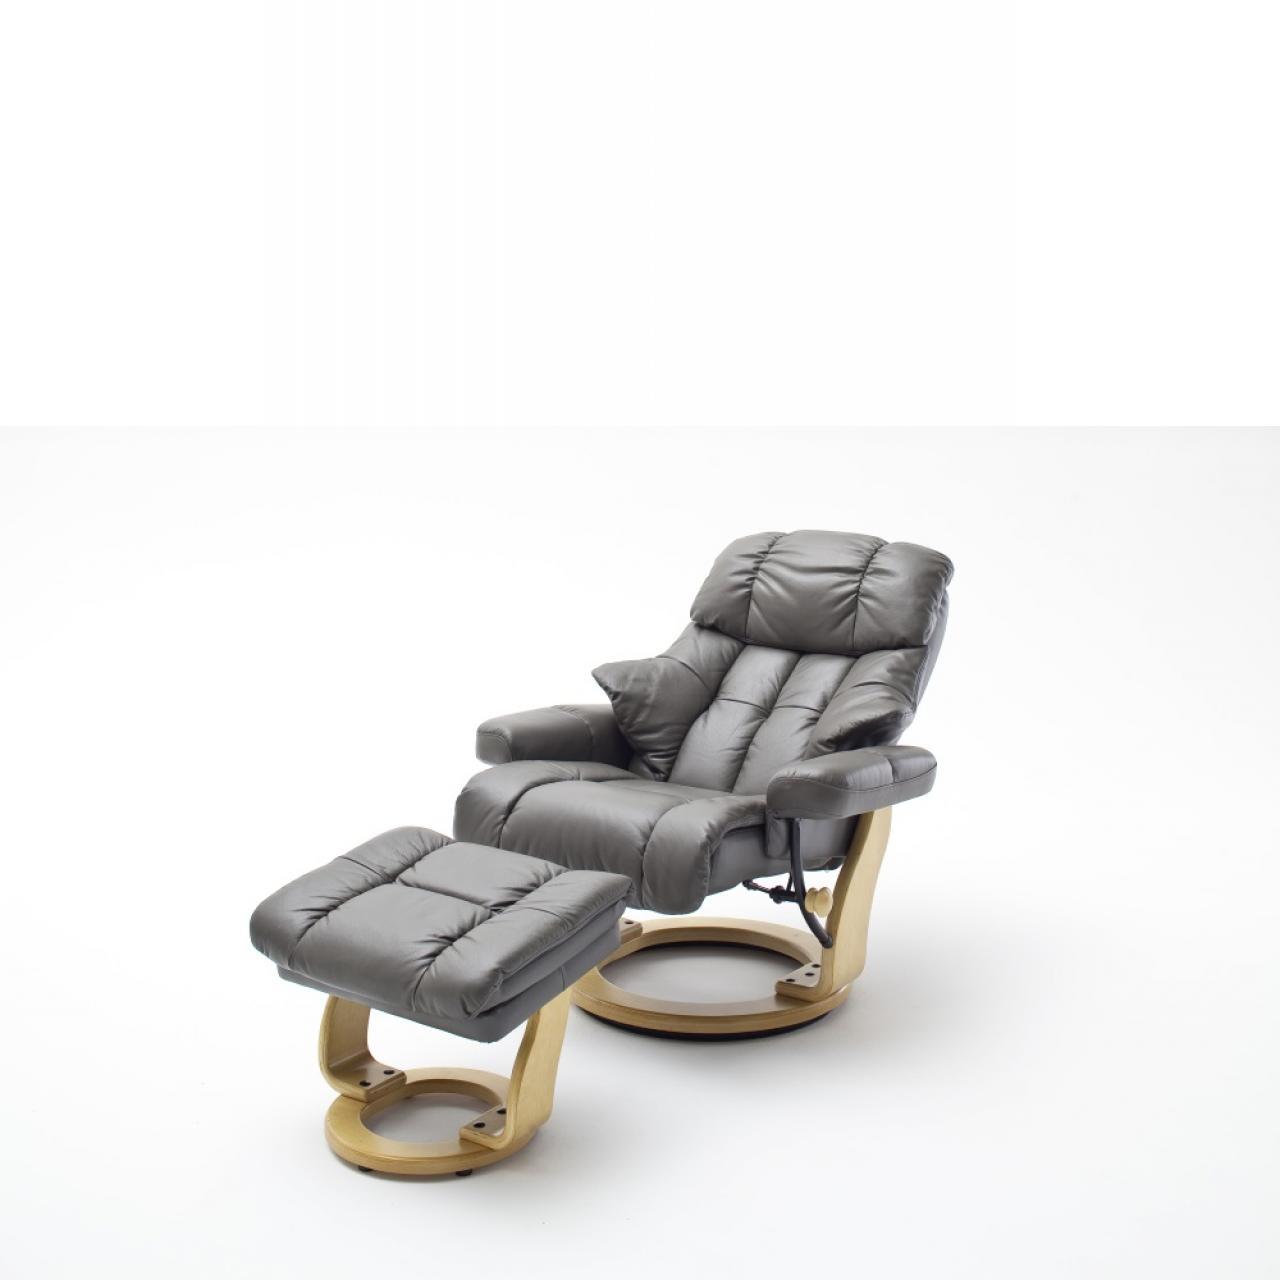 calgary 180 xxl 64038tn5 sessel polsterm bel m bel j hnichen center gmbh. Black Bedroom Furniture Sets. Home Design Ideas